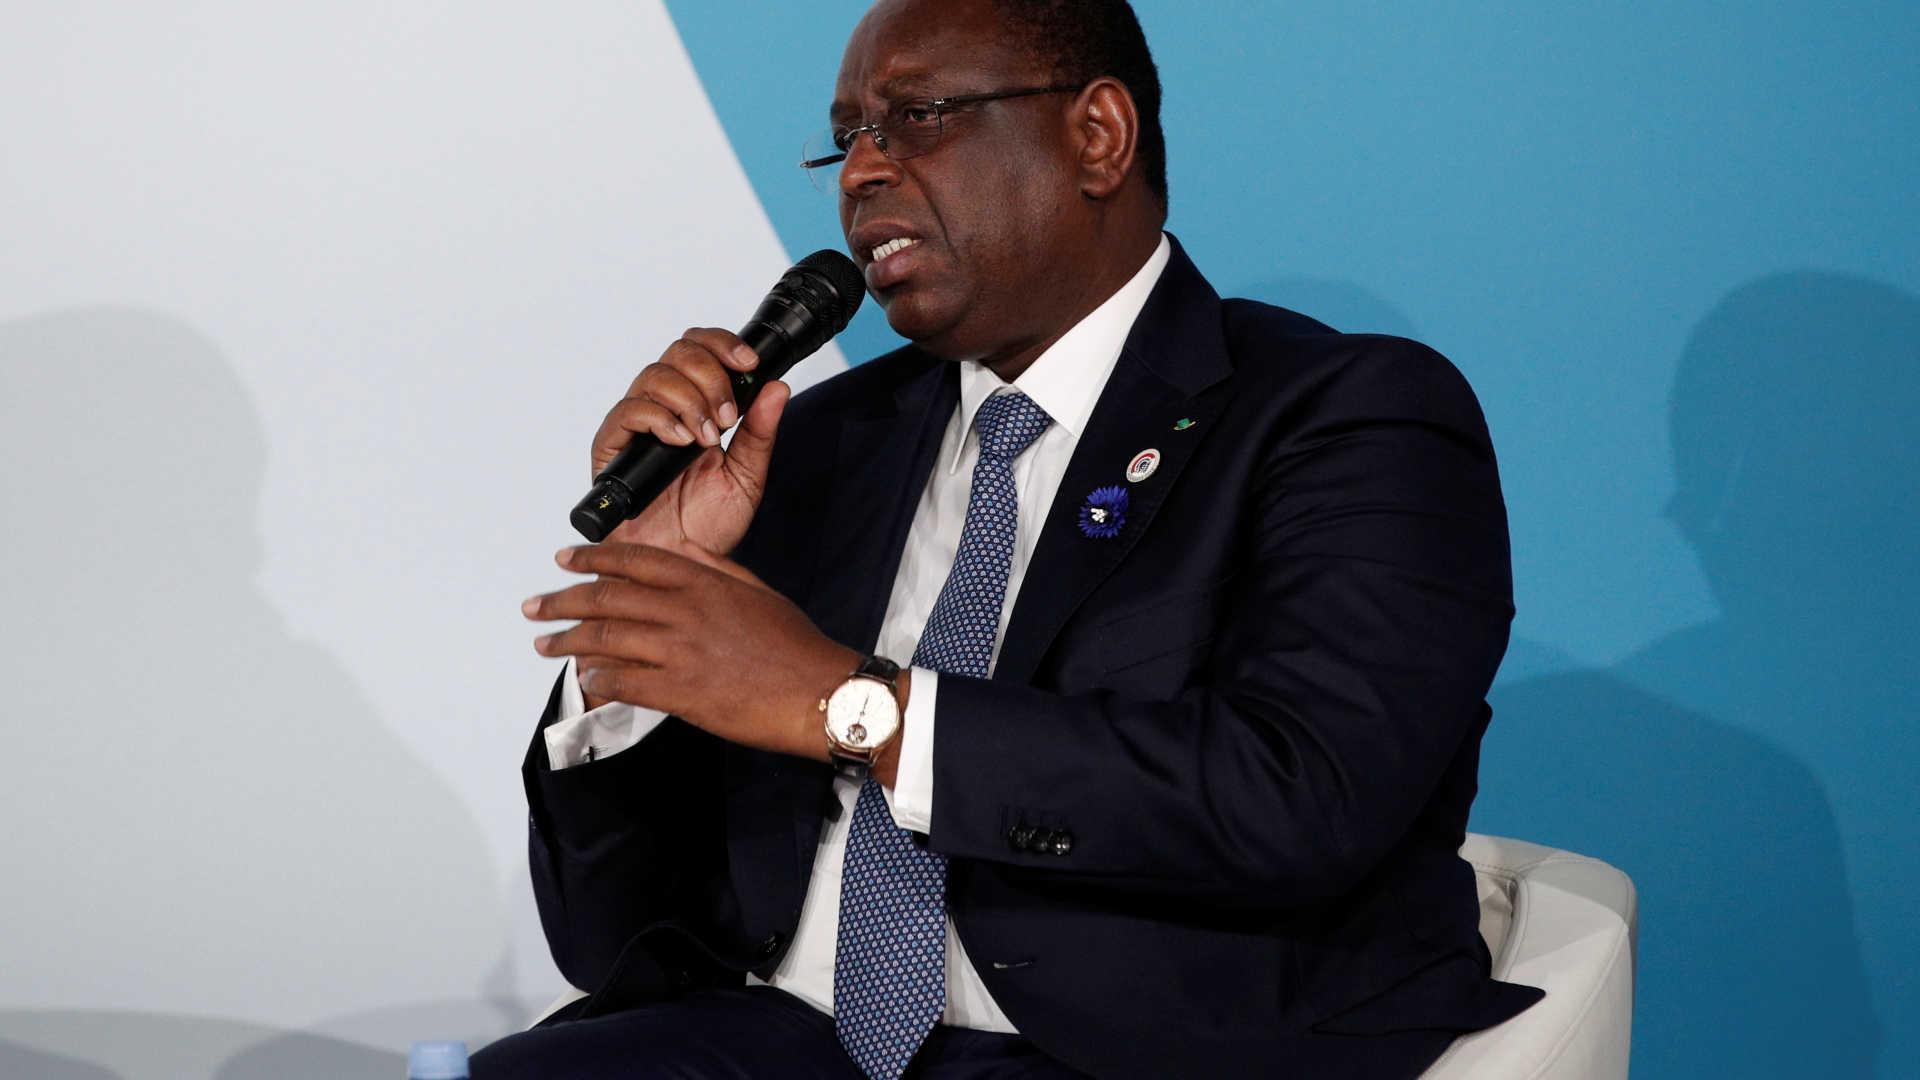 presidente senegalês macky sall reeleito à primeira volta - Macky Sall  - Presidente senegalês Macky Sall reeleito à primeira volta